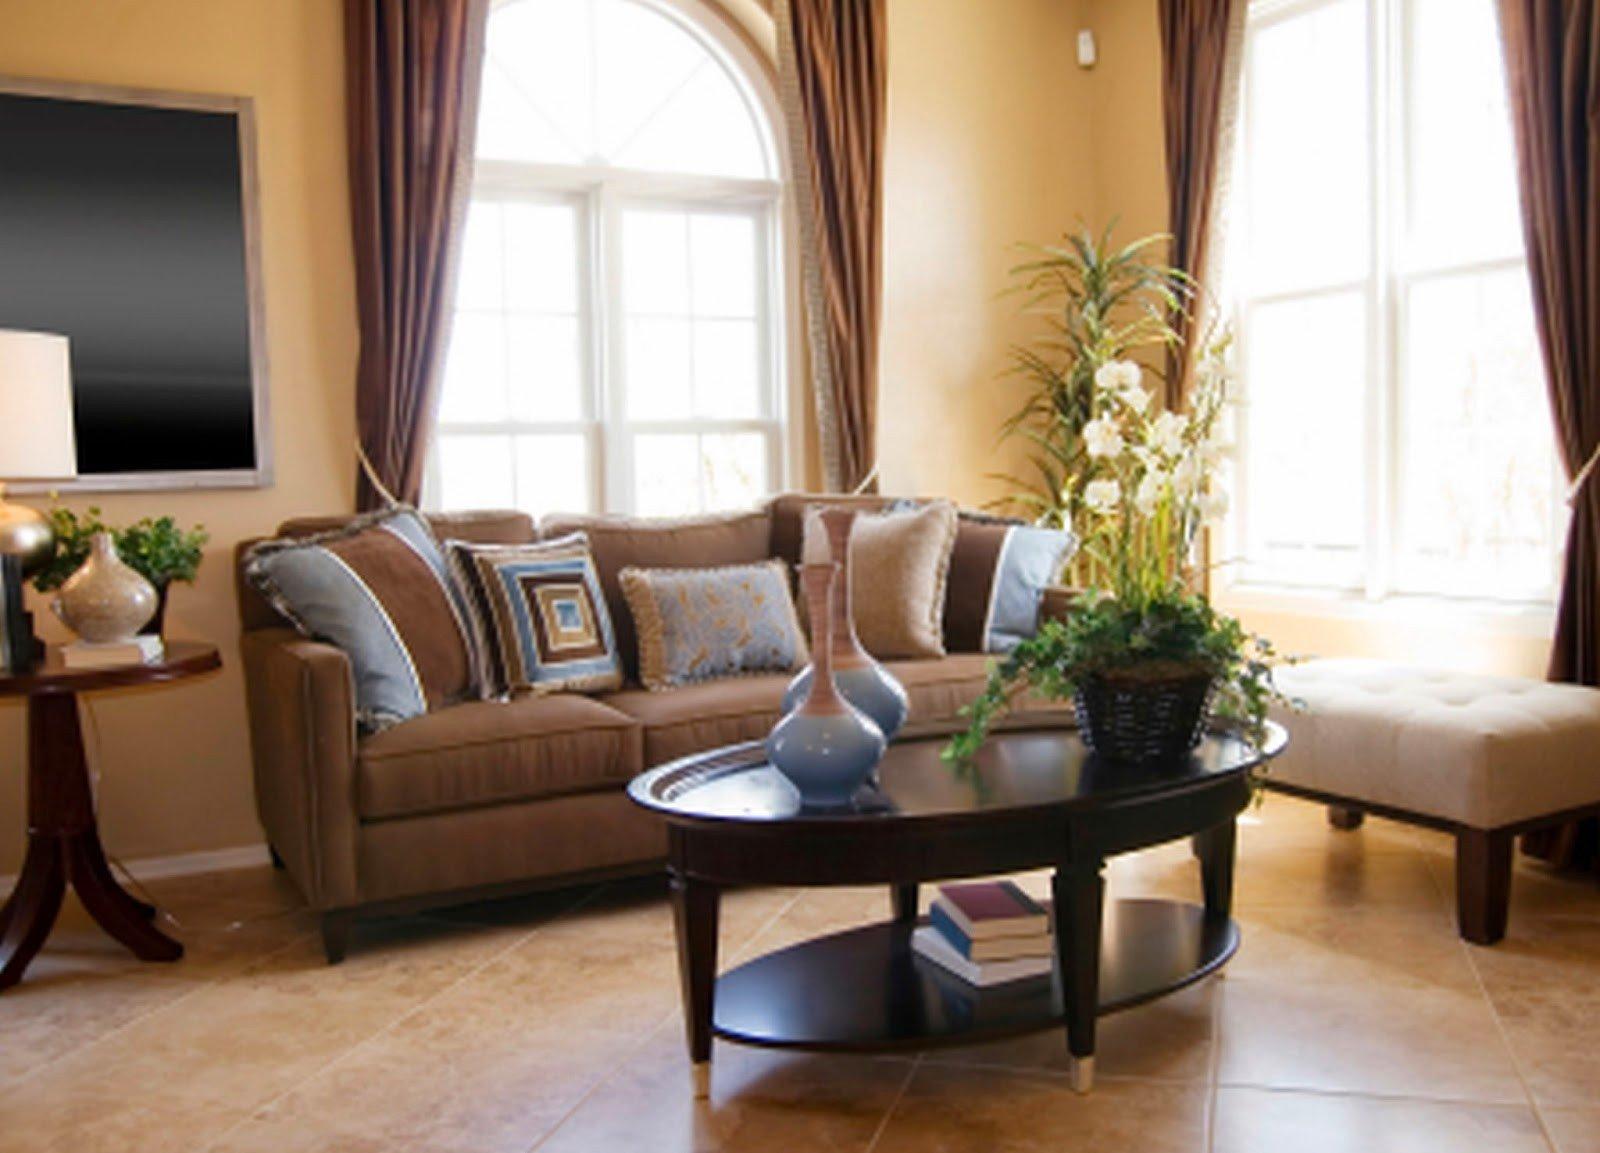 Living Room Home Decor Ideas 2 Living Room Decor Ideas Brown Leather sofa